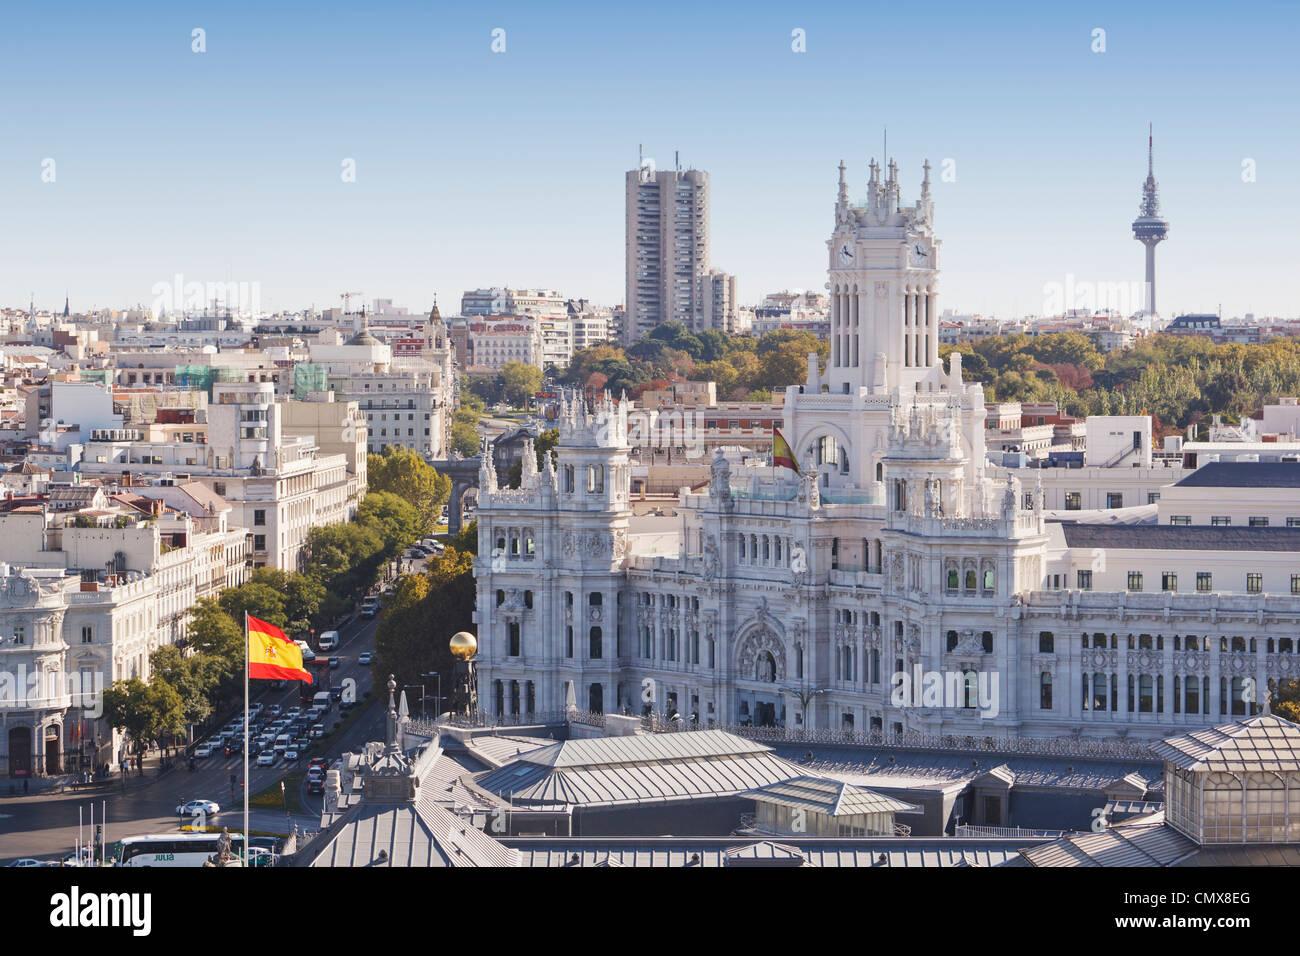 Madrid, Spagna. Cibeles Palace in Plaza de Cibeles. Immagini Stock